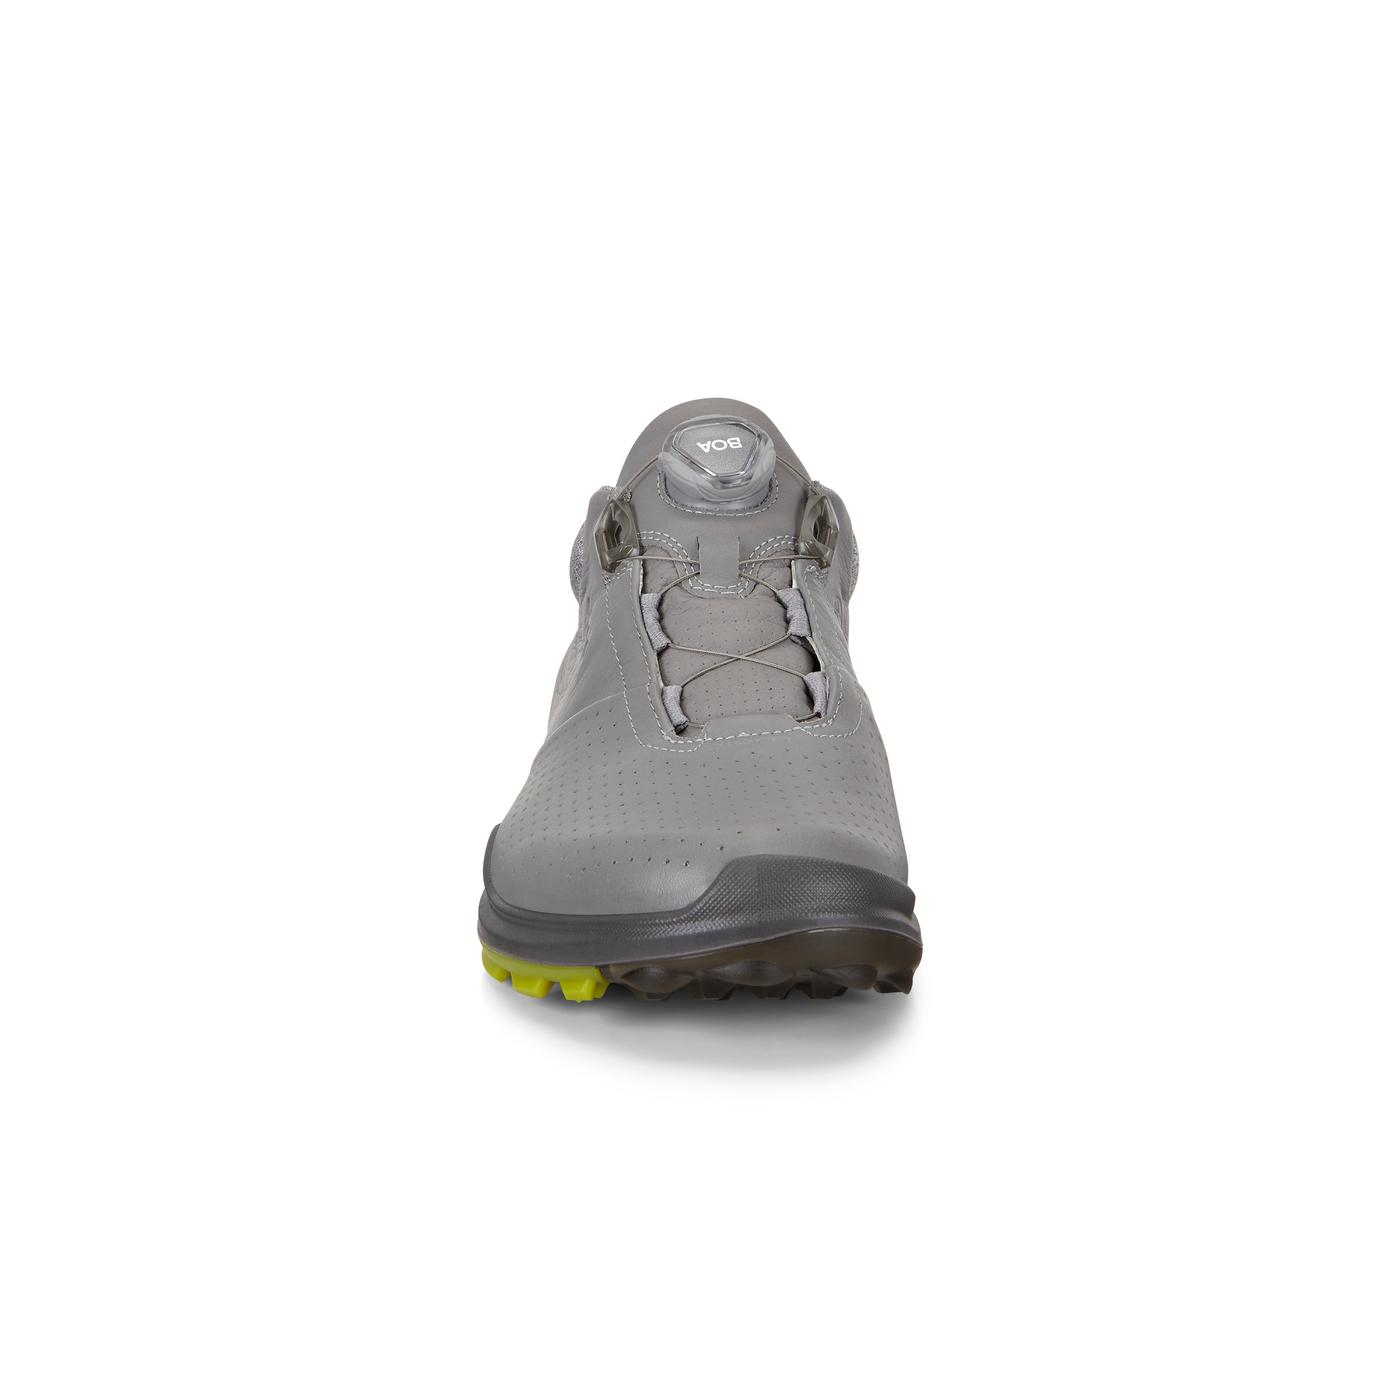 ECCO BIOM HYBRID 3 BOA Men's Shoe